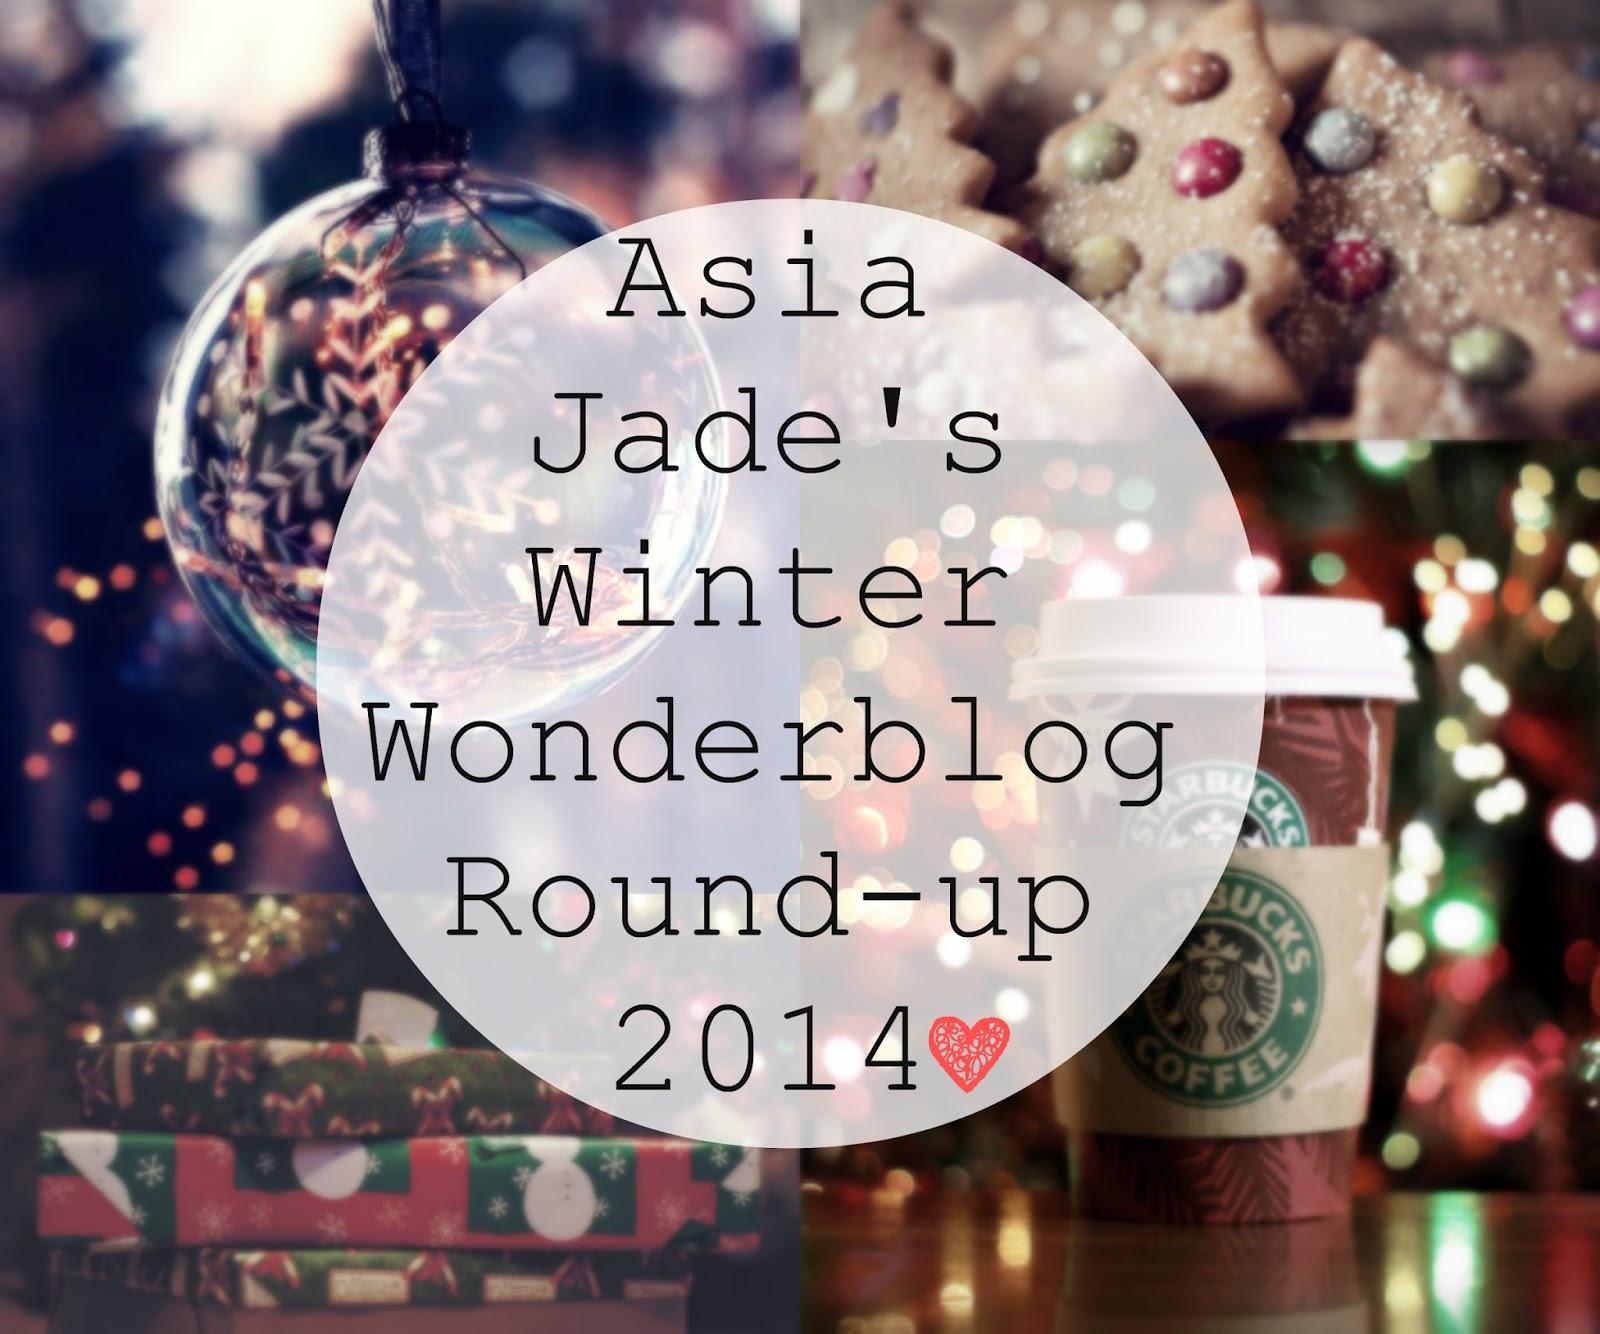 Winter Wonderblog Round-up 2014